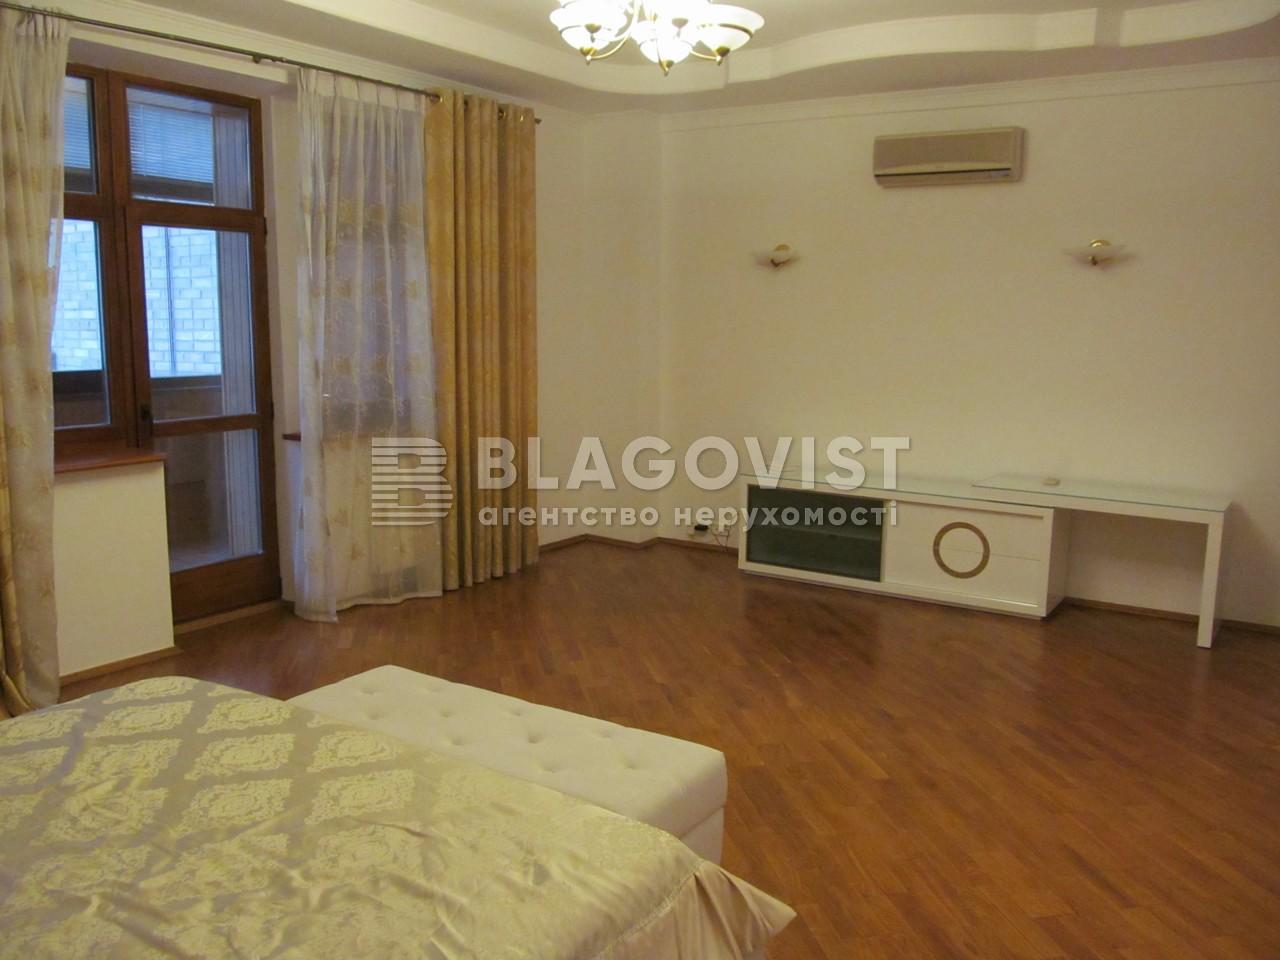 Квартира C-72808, Павловская, 18, Киев - Фото 17